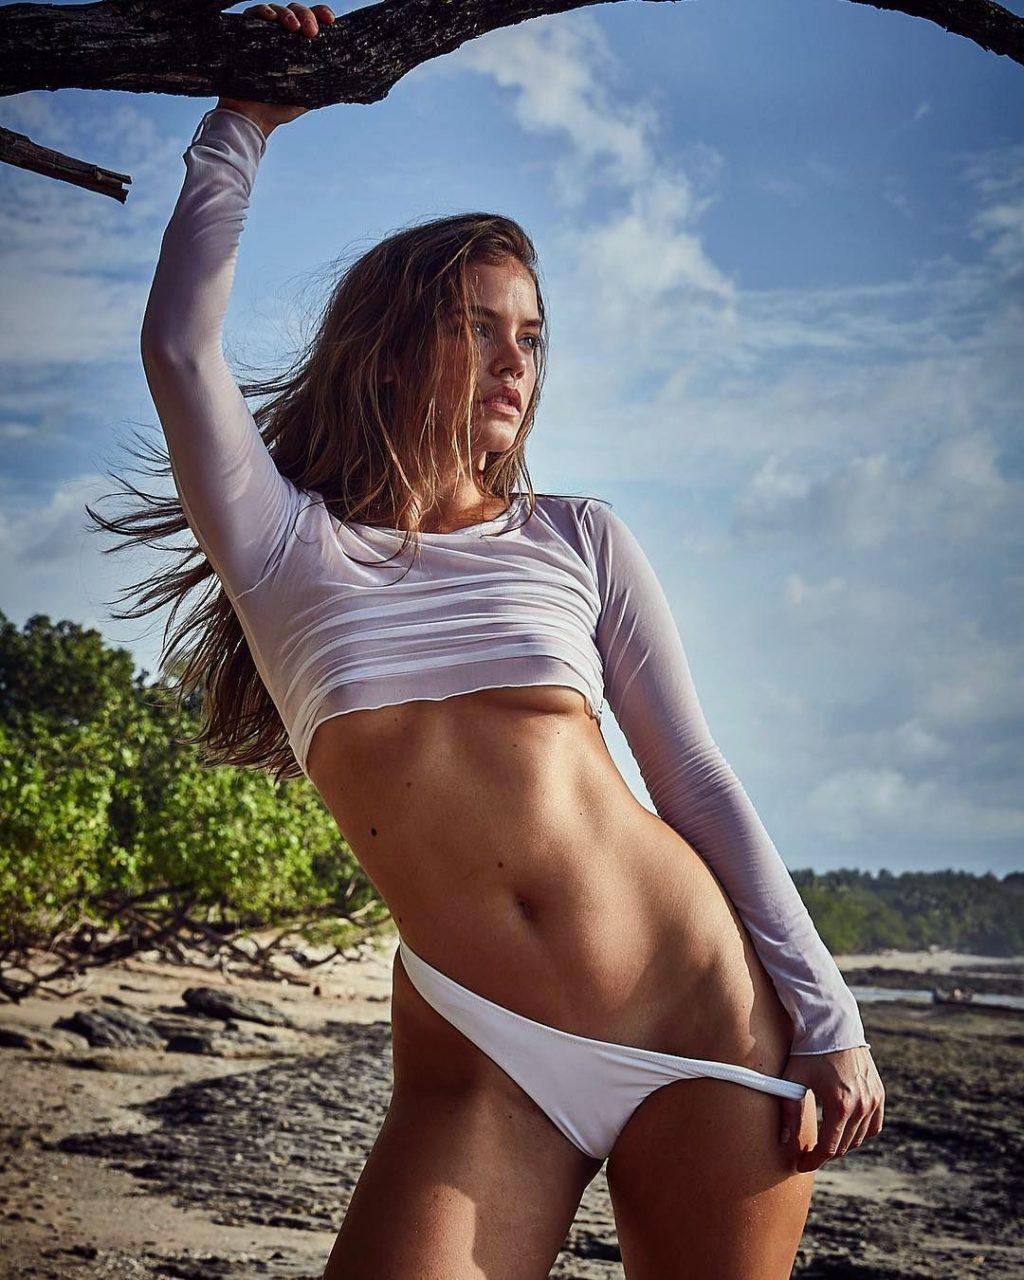 Barbara Palvin Hot girlfappening.com 1